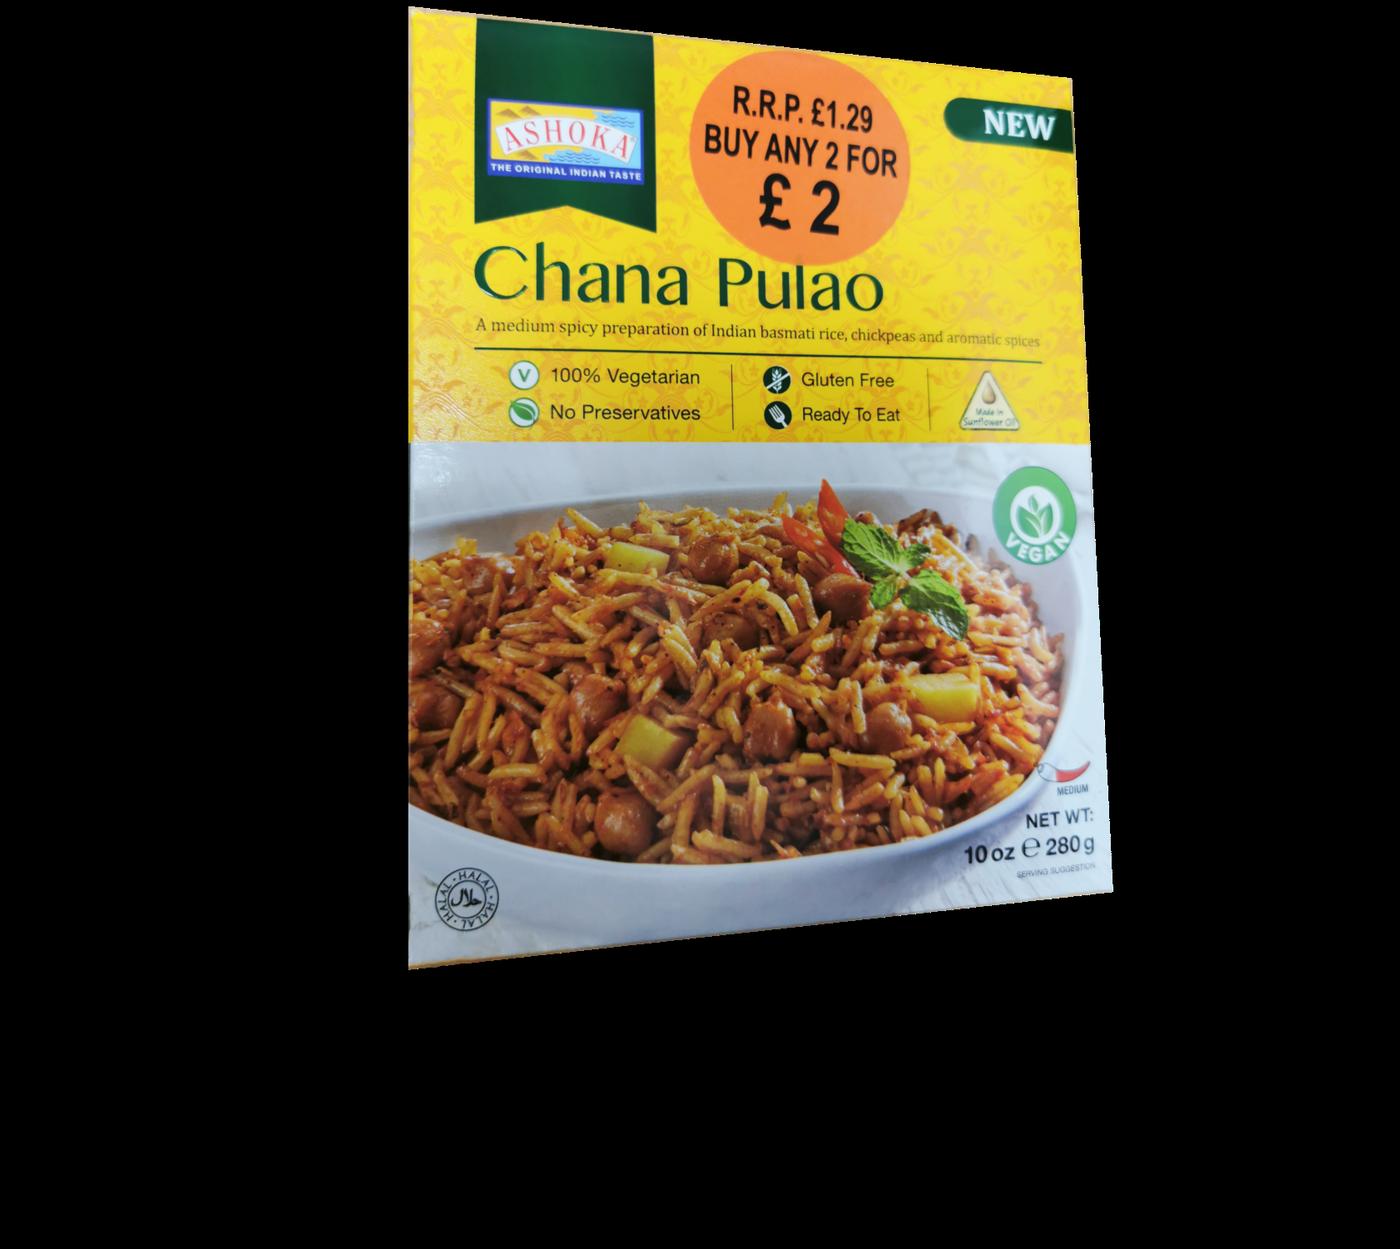 Ashoka Chana Pulao (Vegan)